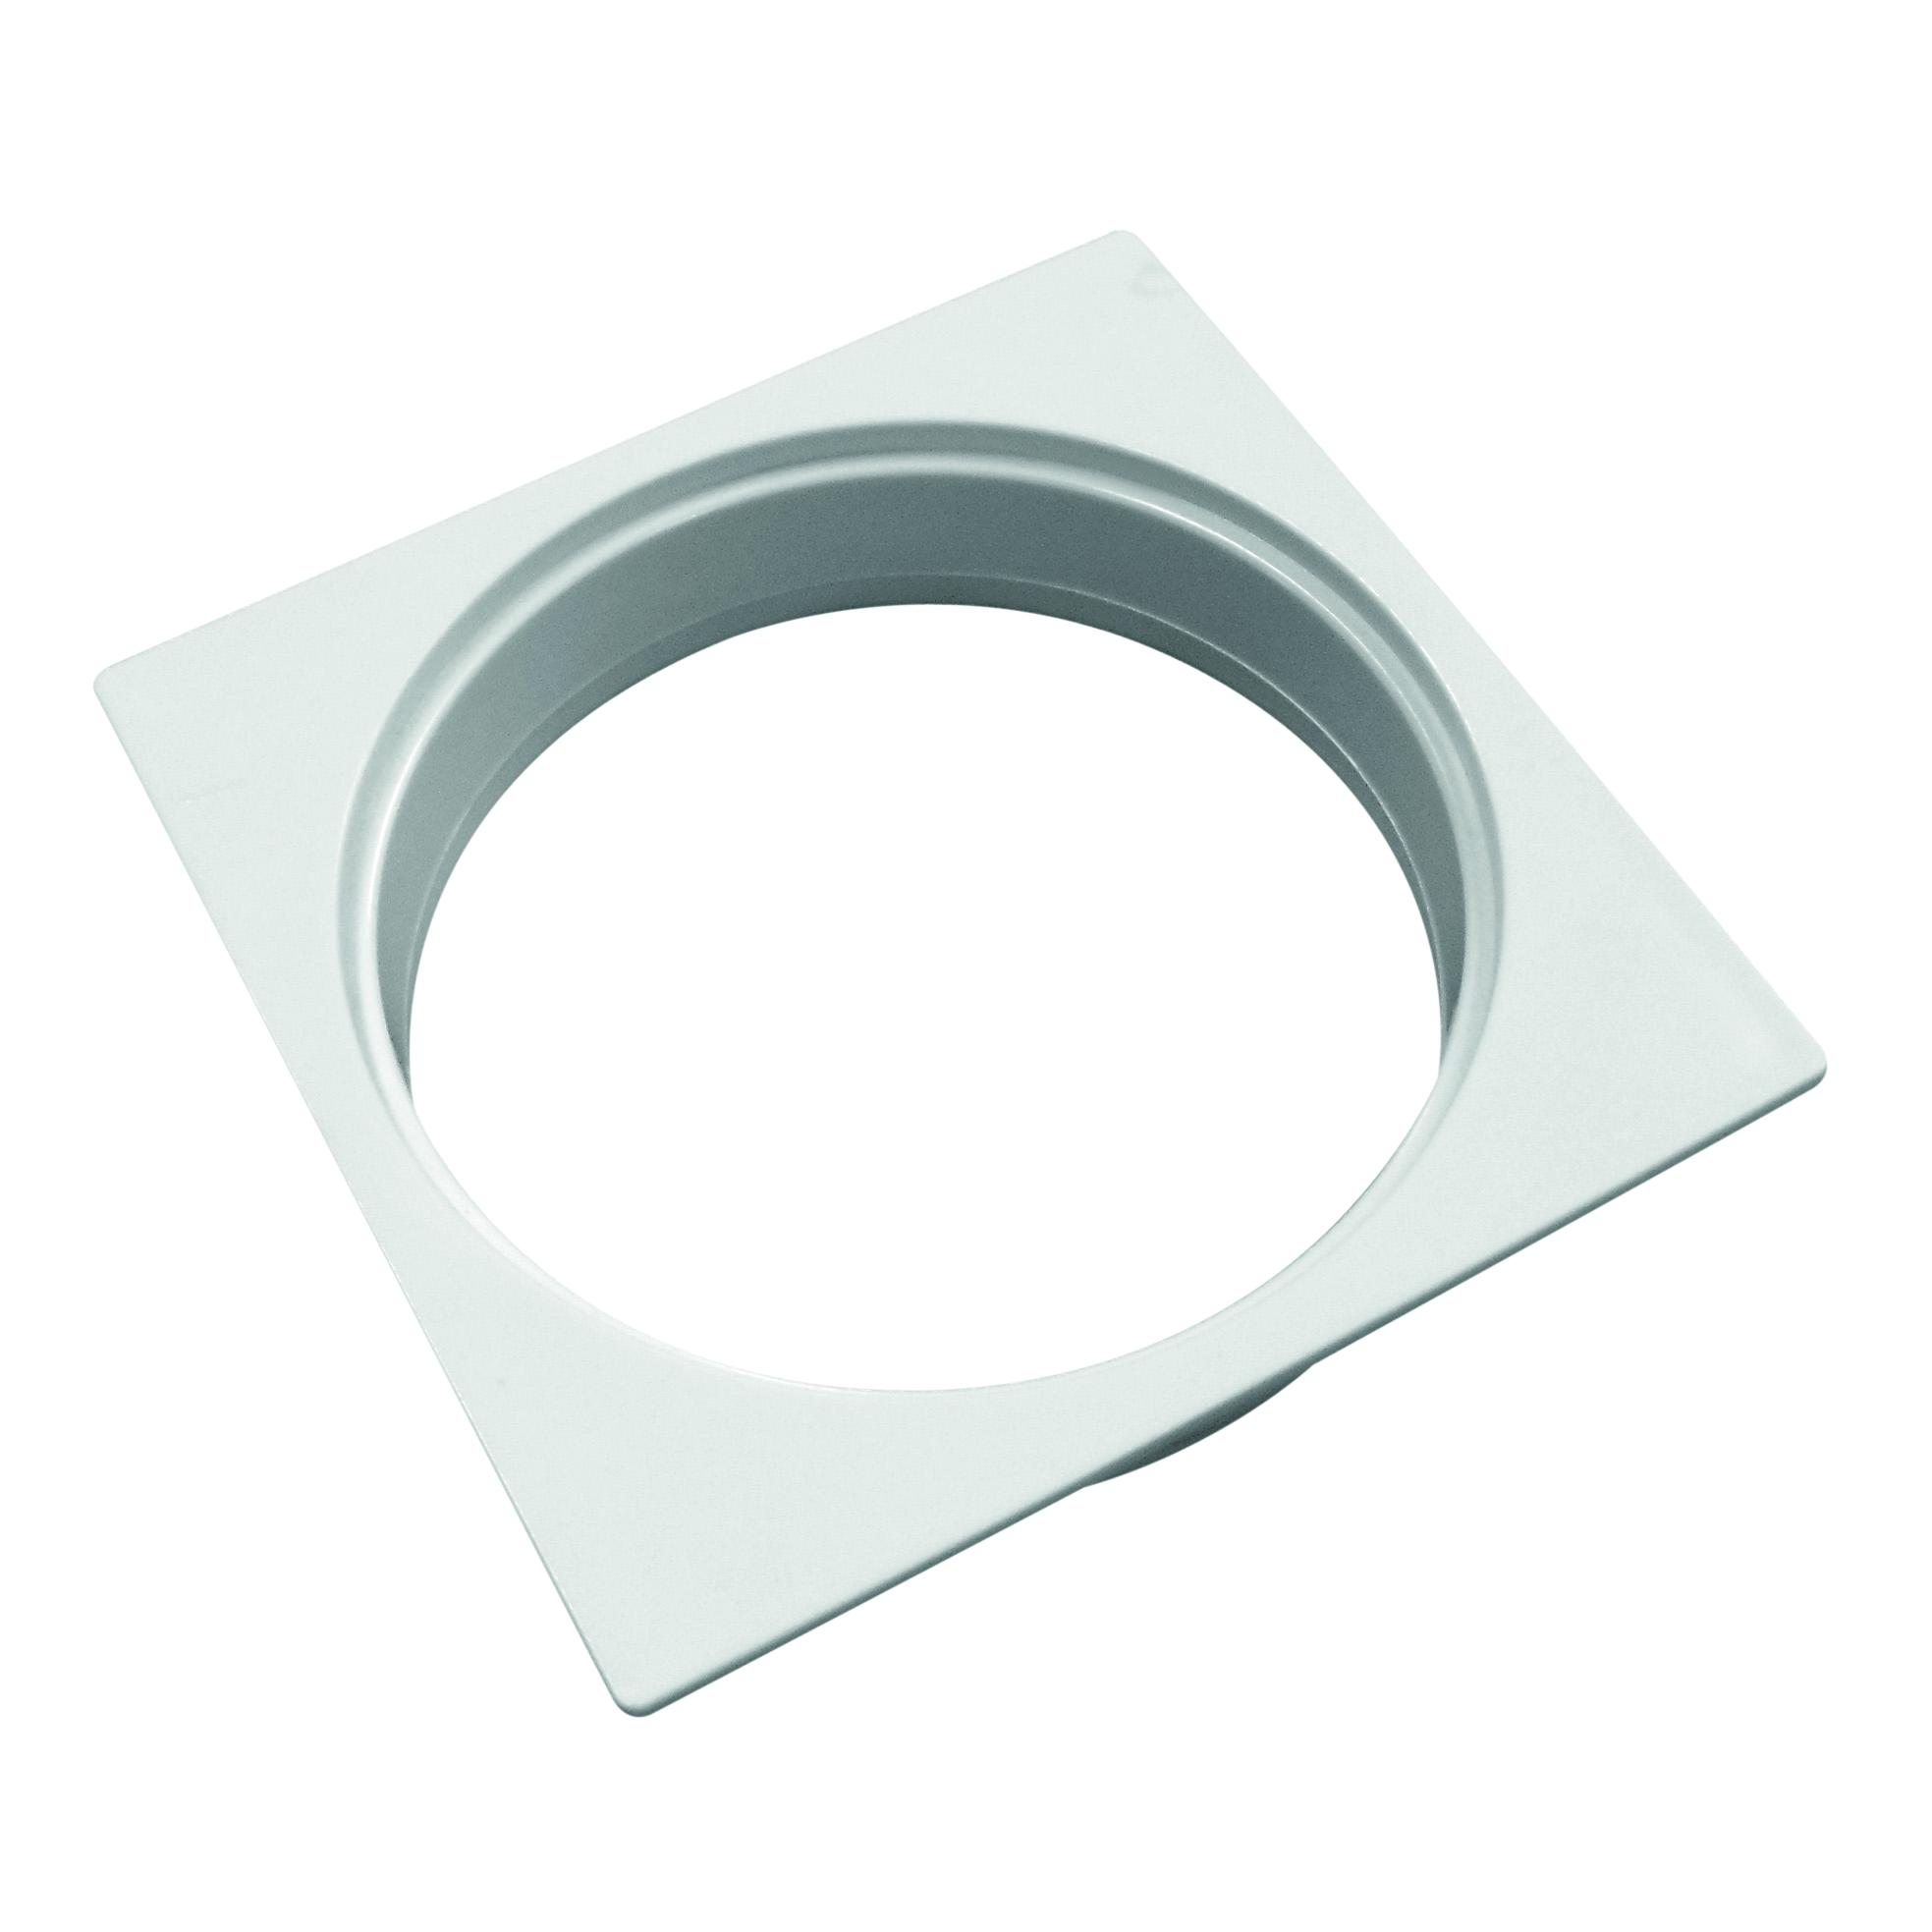 Porta-Grelha Caixa Sifonada 100 mm Quadrado Branco 11773 - Amanco